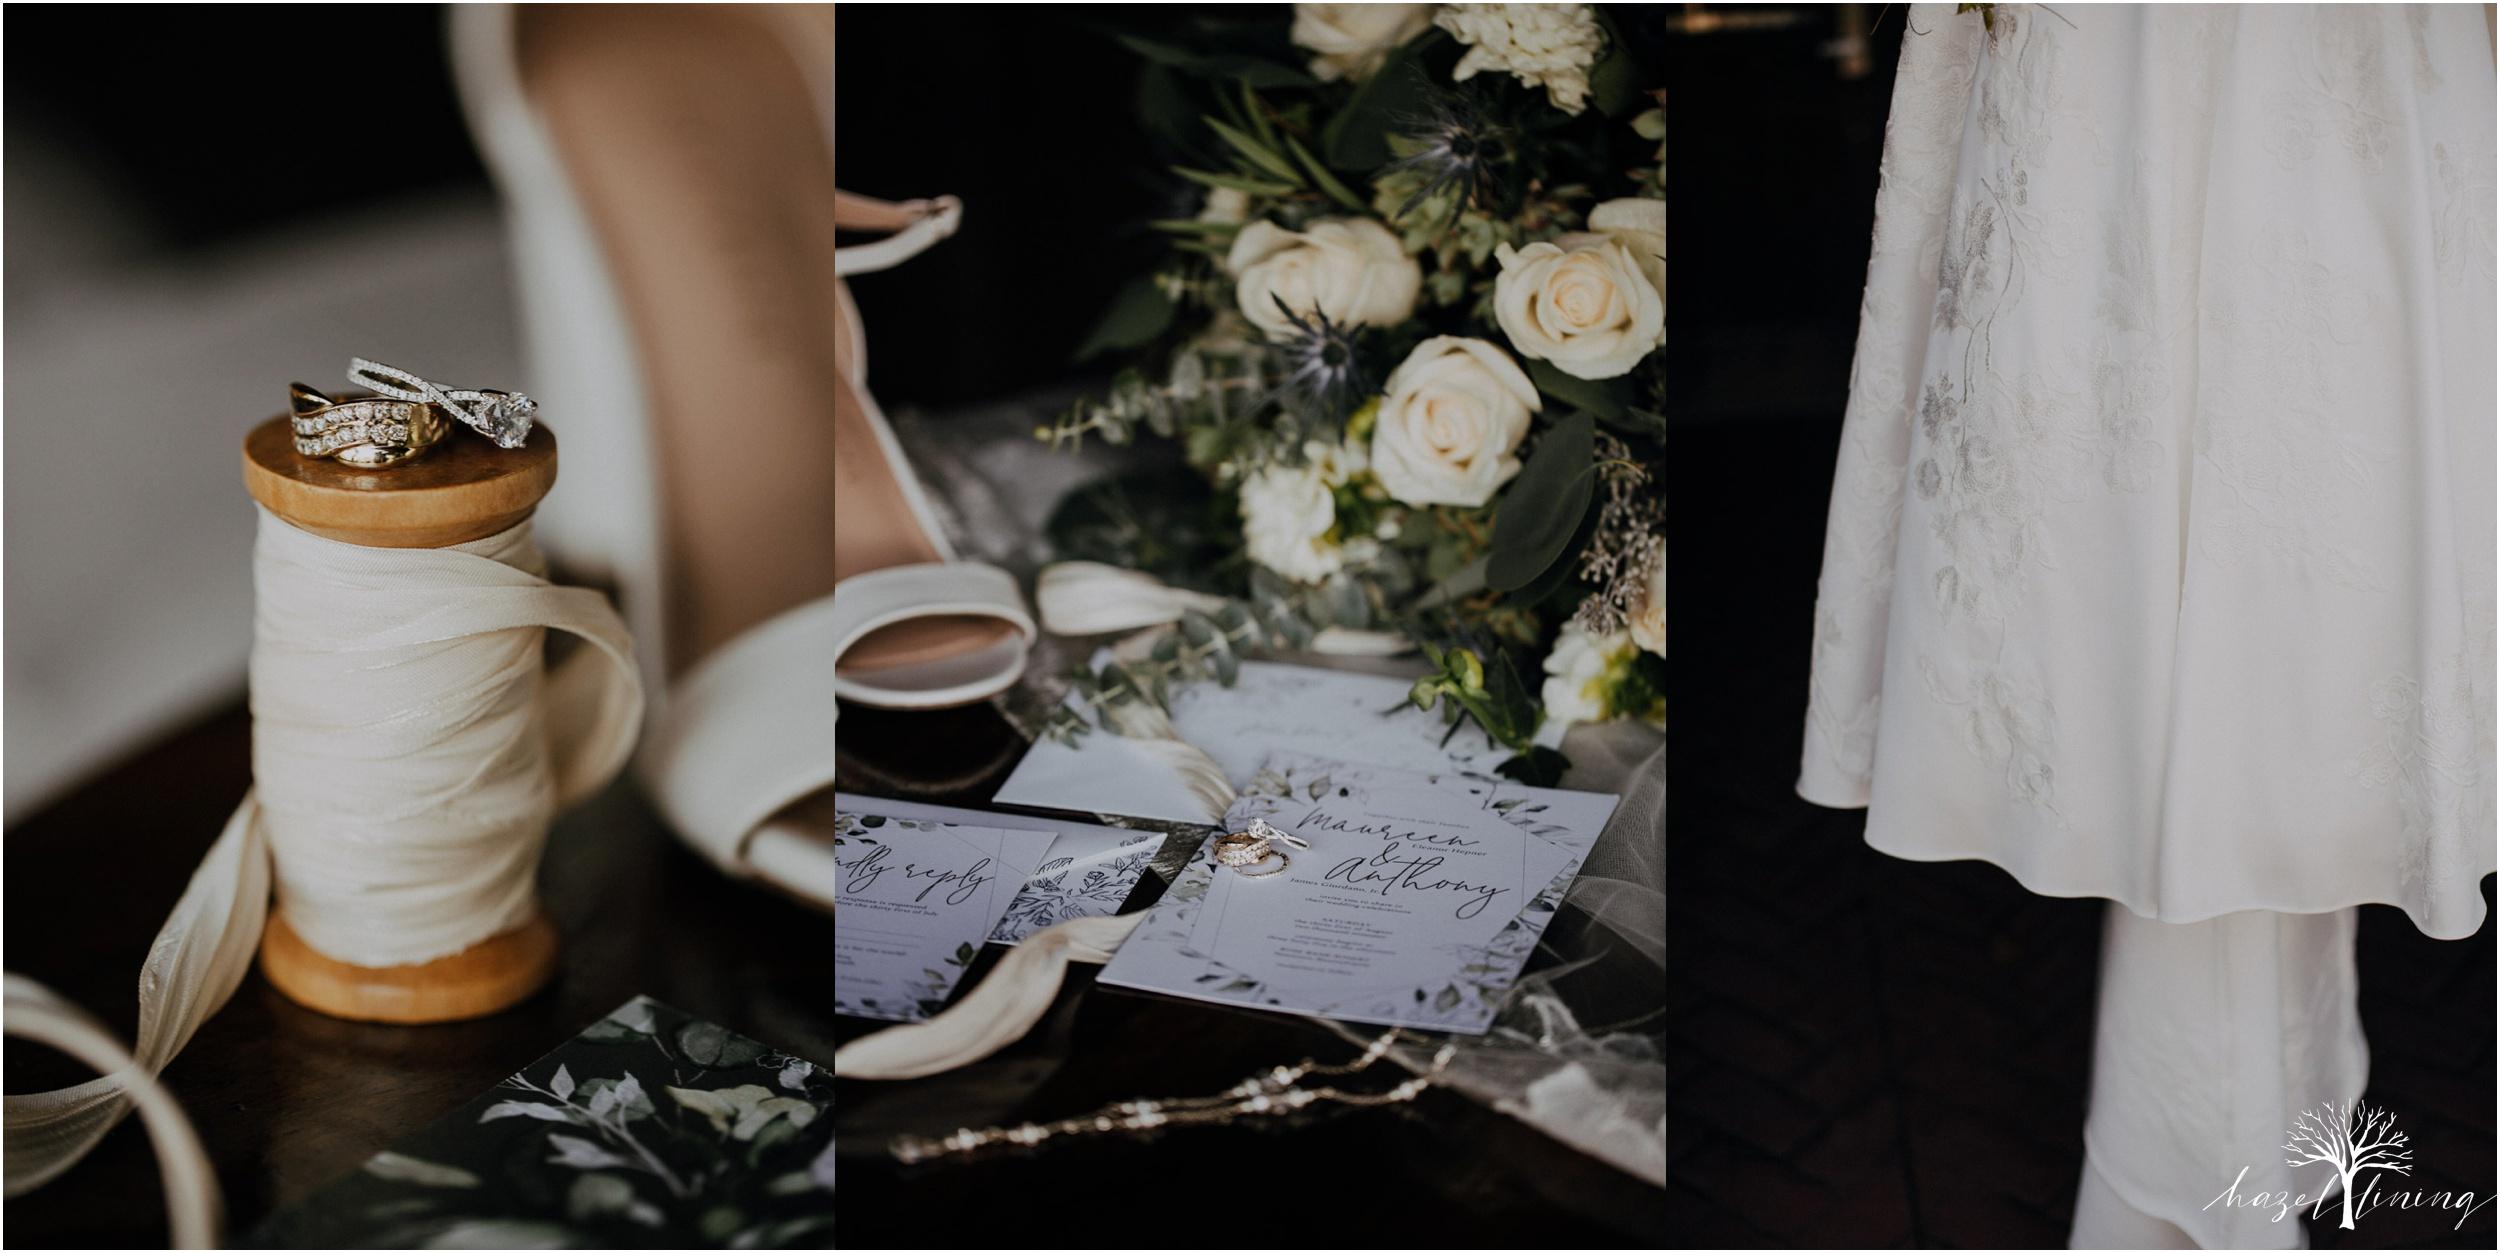 maureen-hepner-anthony-giordano-rose-bank-winery-newtow-pennsylvania-luxury-summer-wedding-hazel-lining-photography-destination-elopement-wedding-engagement-photography_0008.jpg